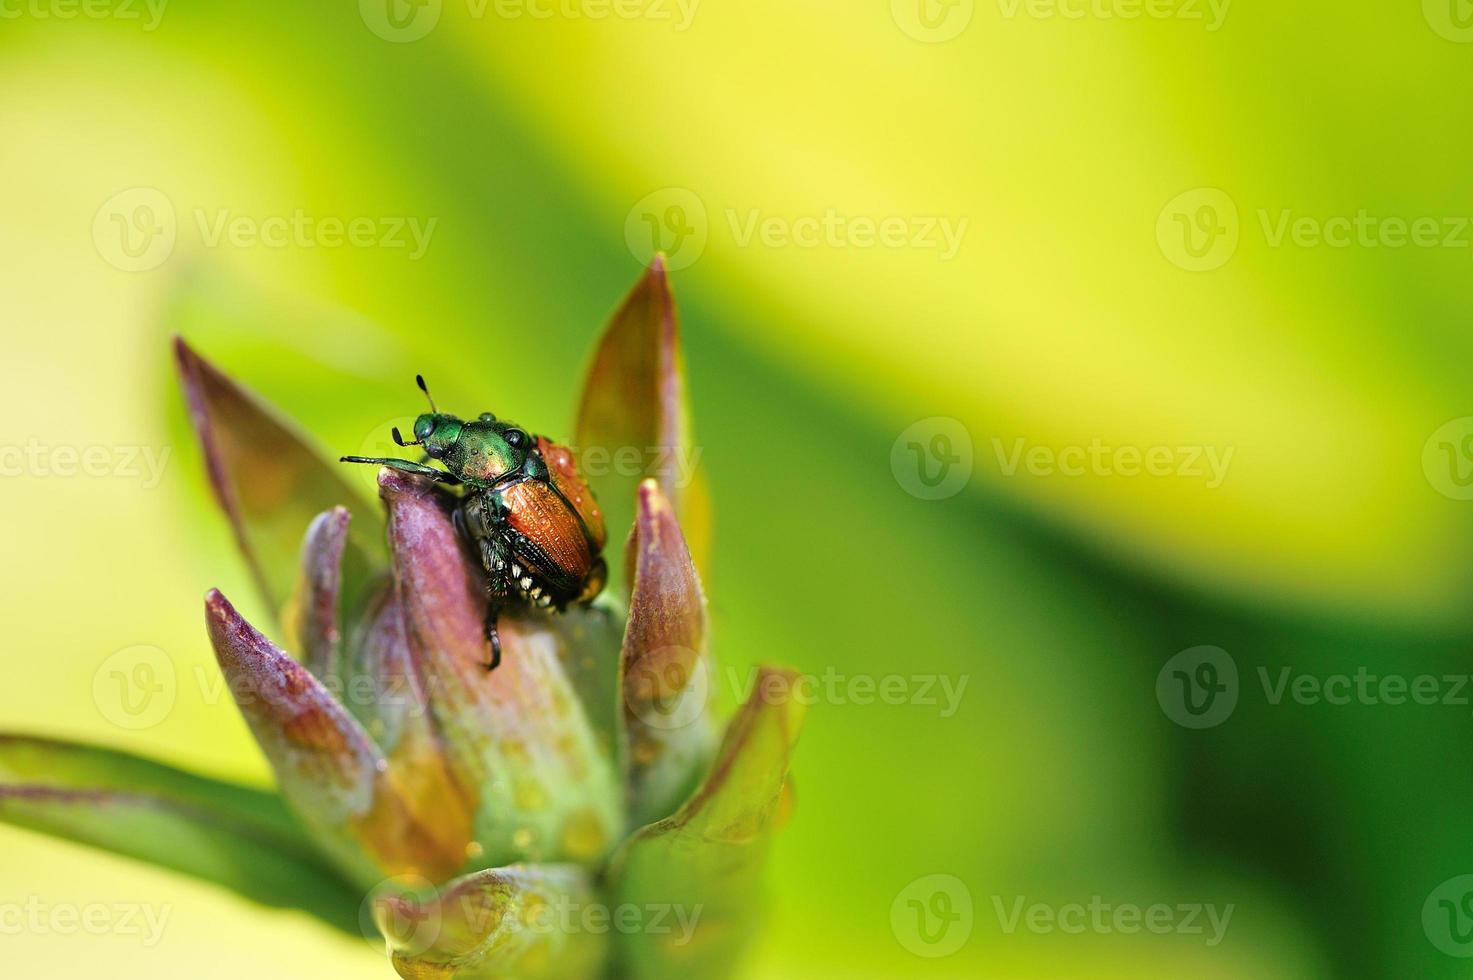 Hosta fleur et coléoptère photo